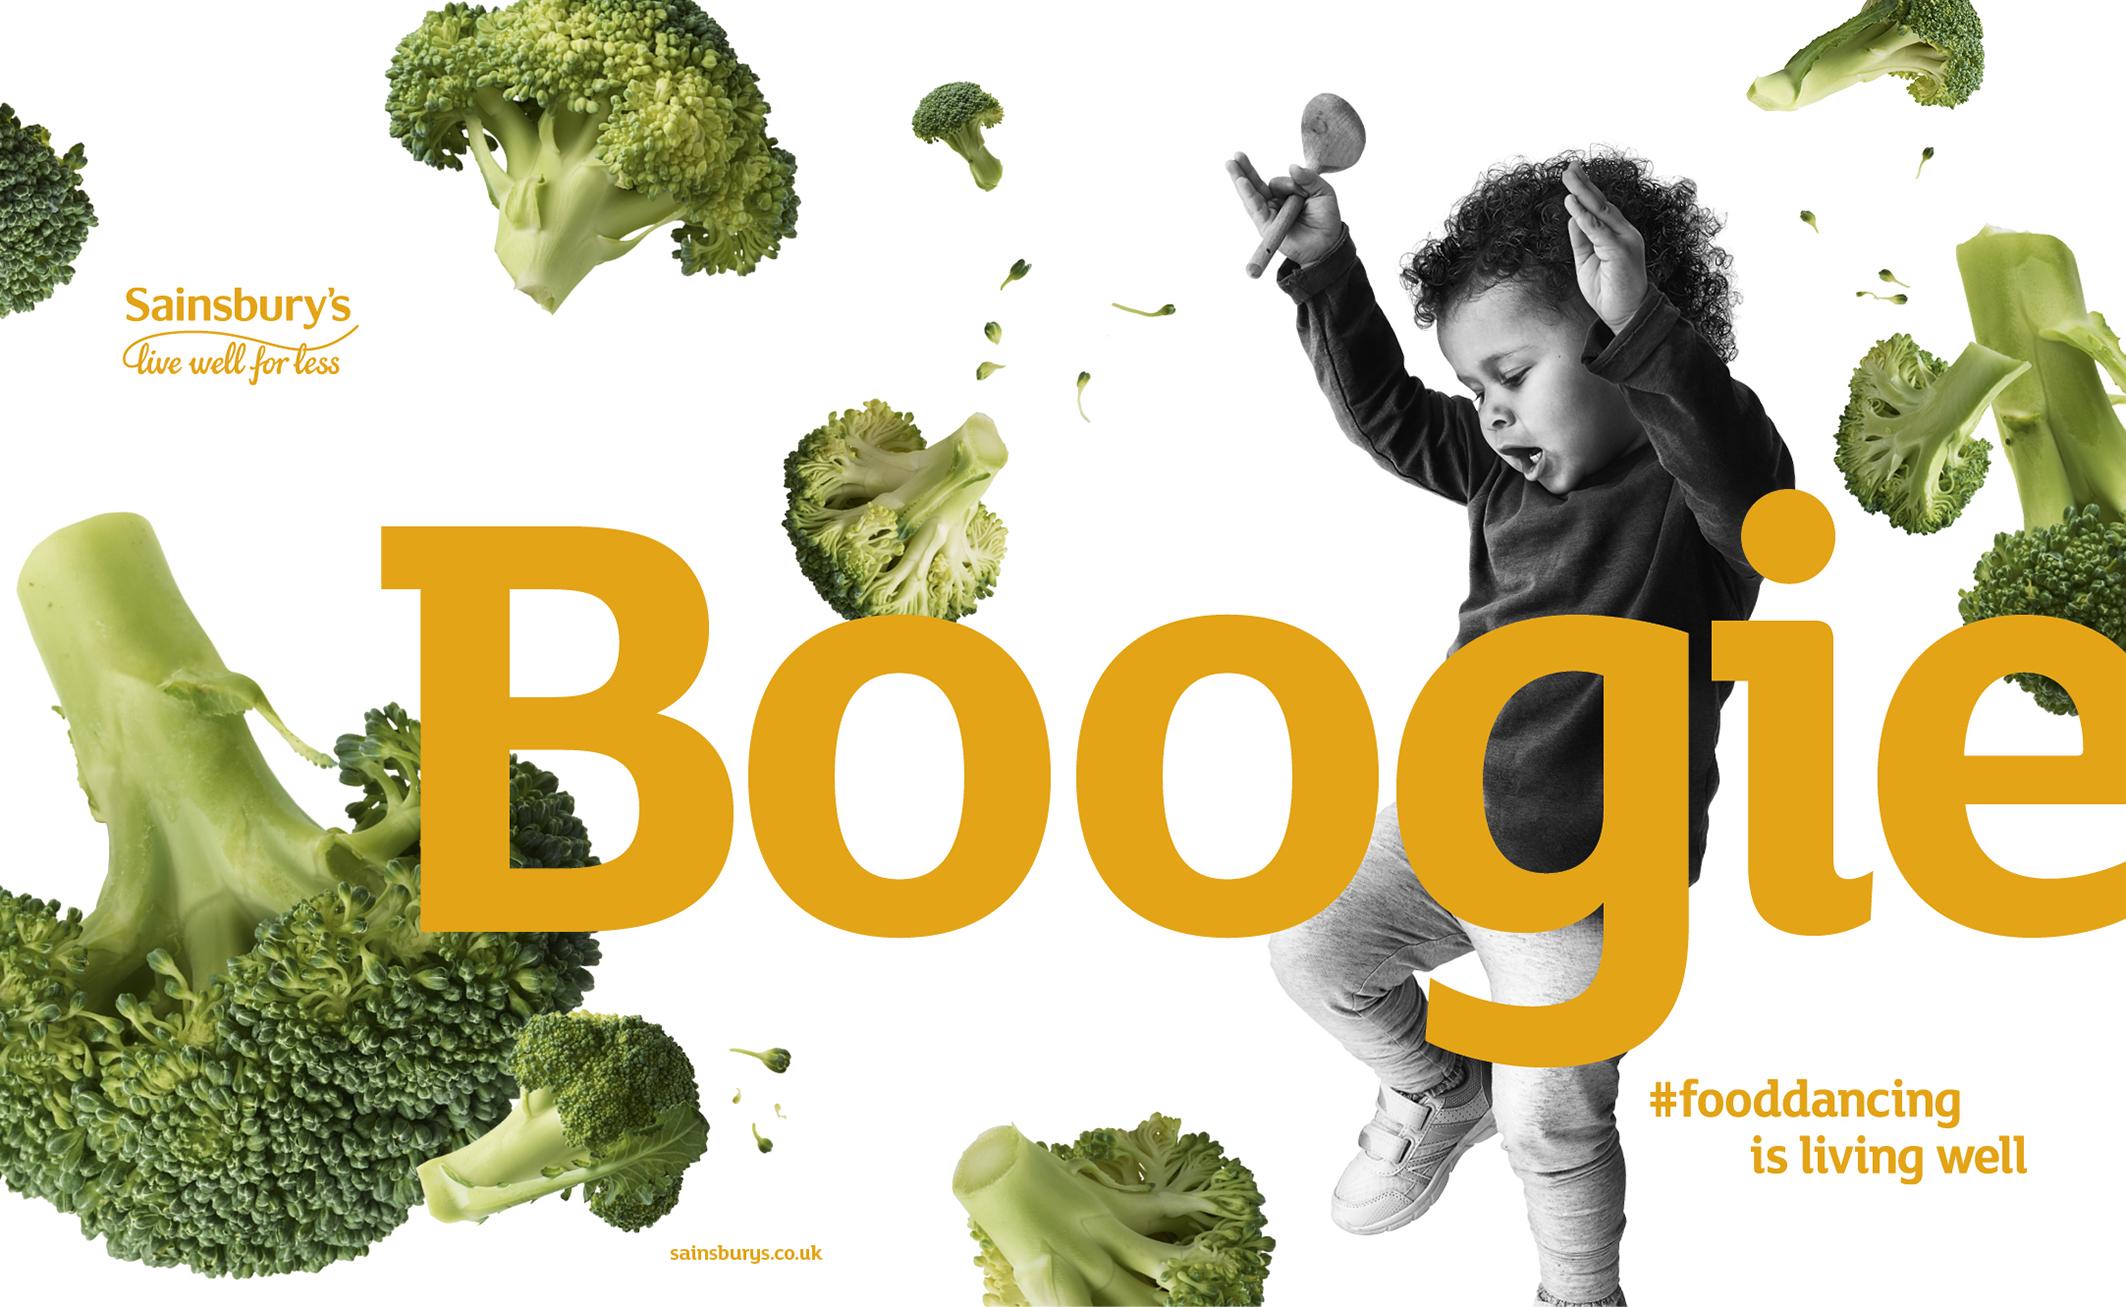 SAI01P16013_Food_dancing_TheSun_DPS_Boogie_v03.jpg